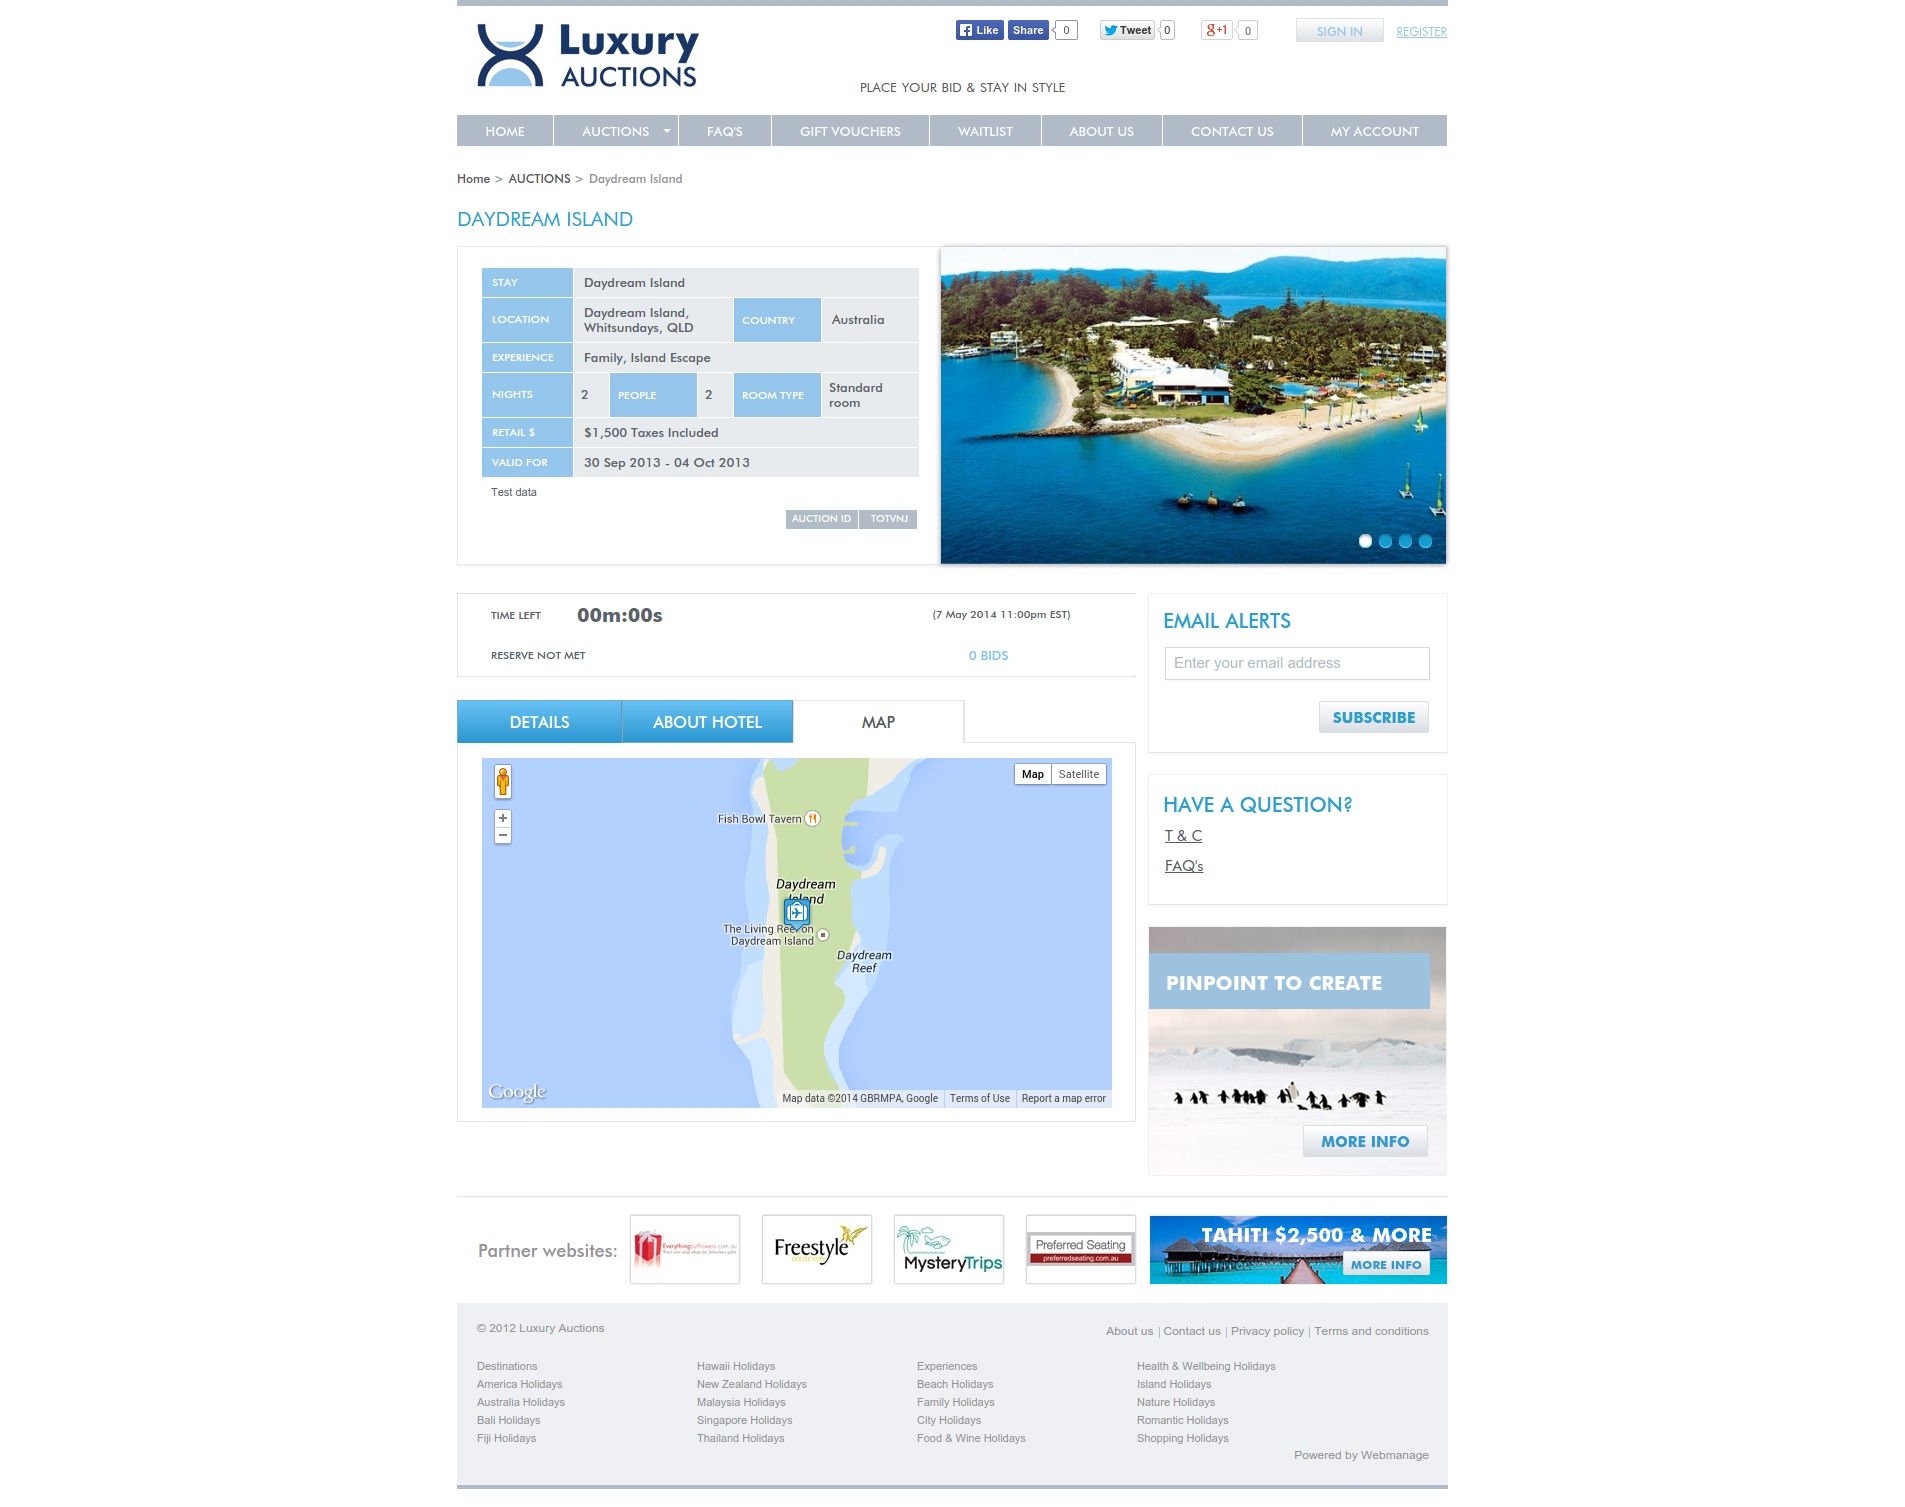 Luxury Travel Auction - Auction Detail